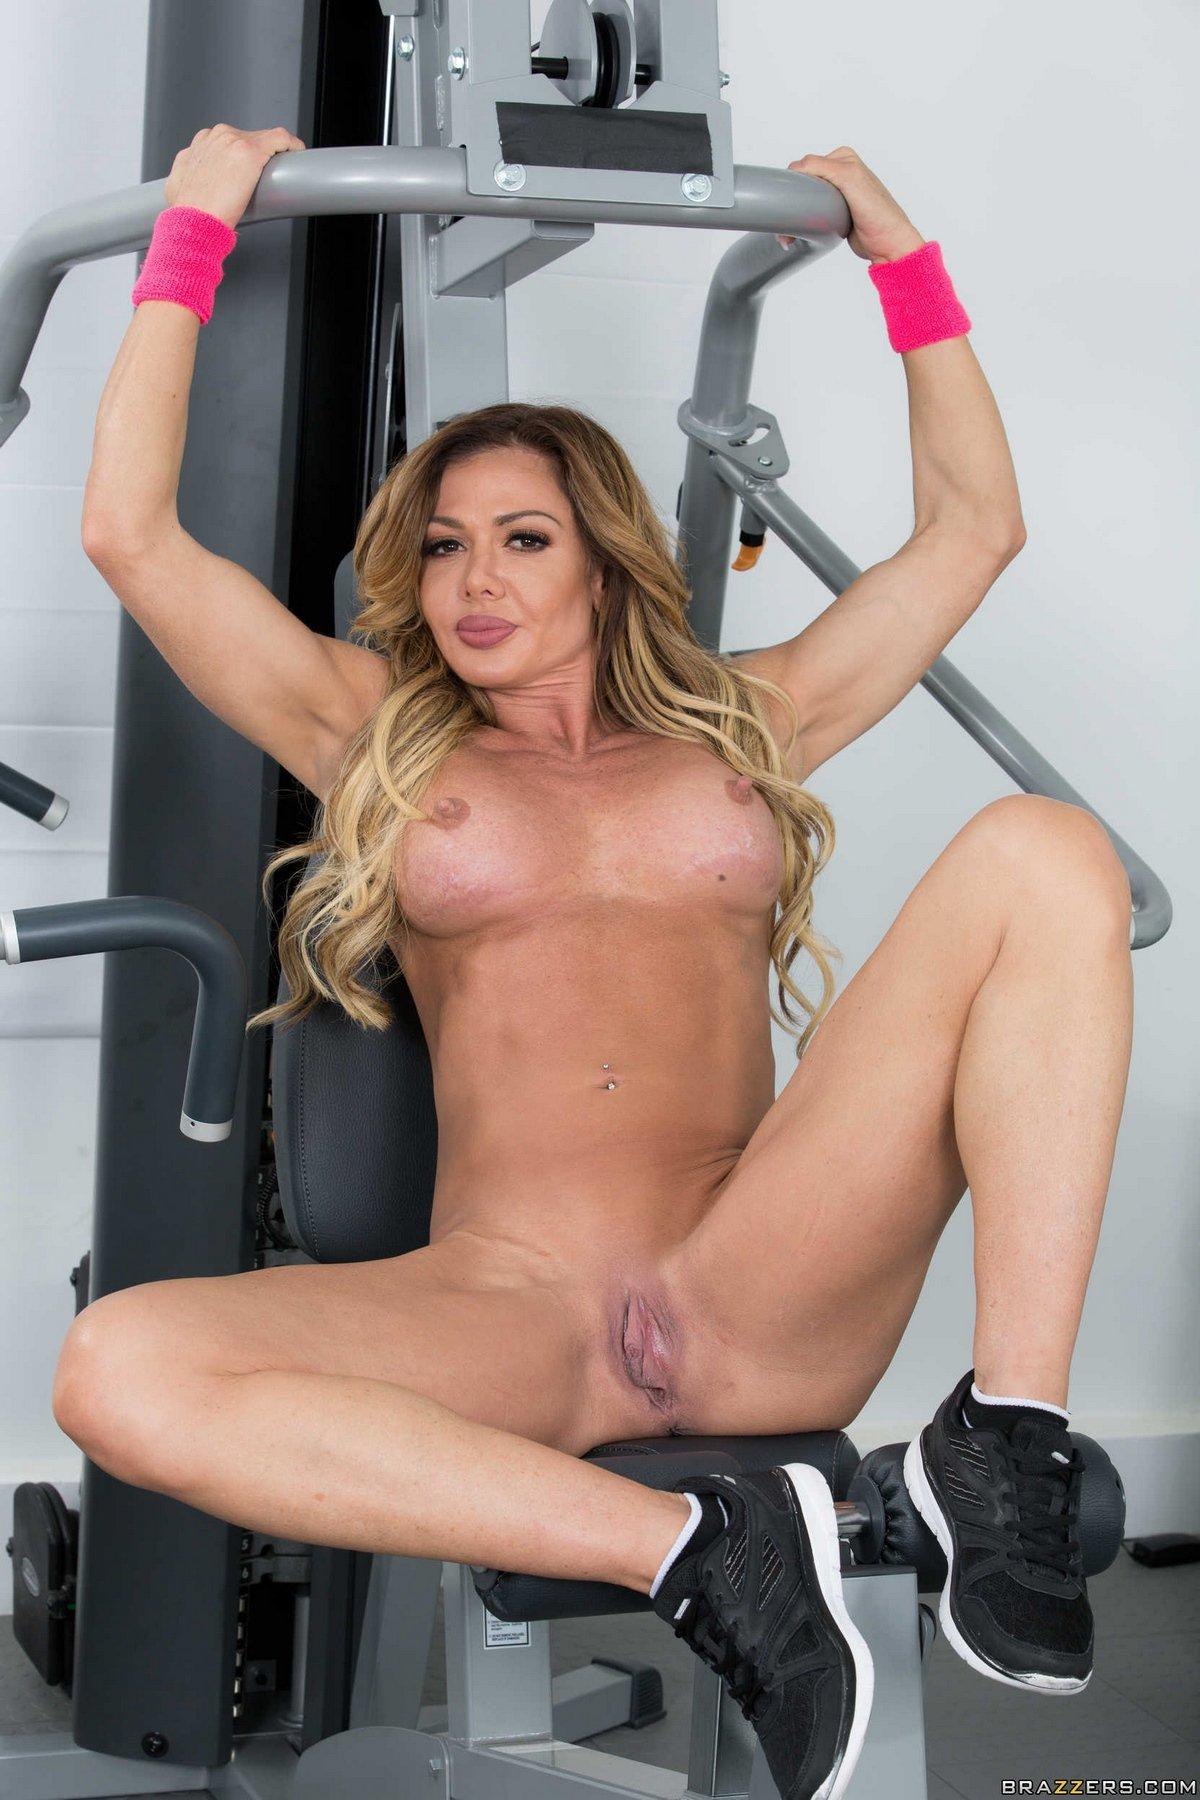 Секс развлечения в спортзале